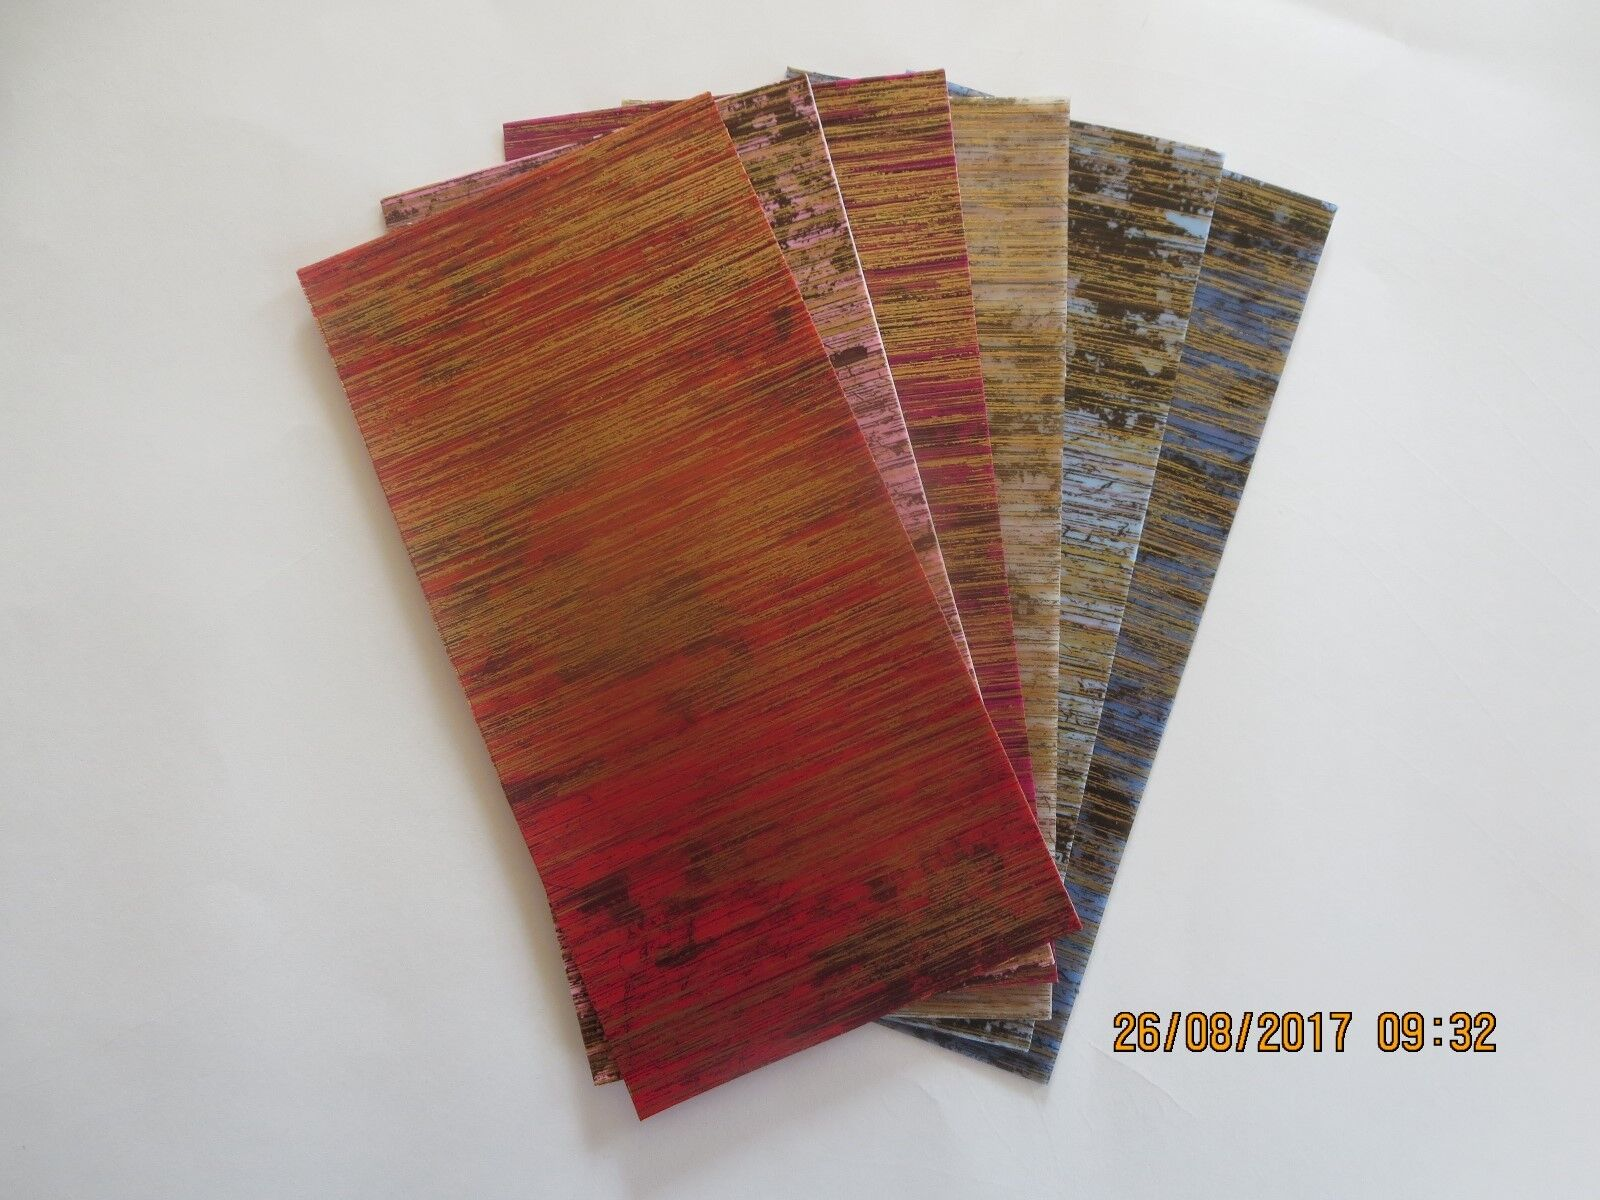 Wachsplatte, Verzierwachs, Wachspl. marmoriert, Wachspl. m. Muster, versch. Farb